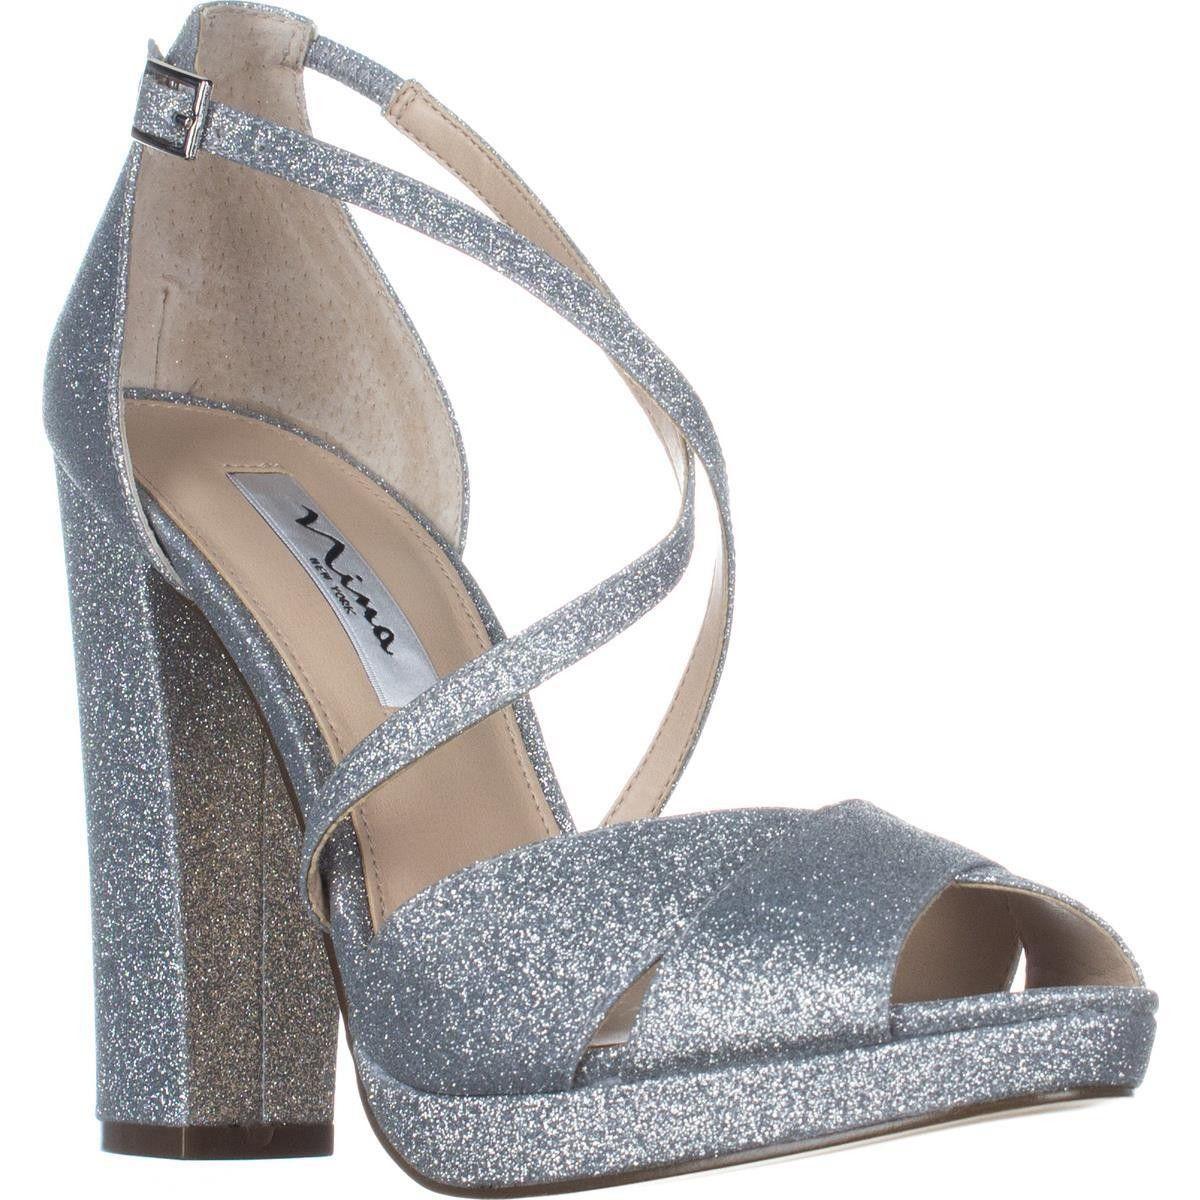 3559a11324f7 Nina Marylyn Peep Toe Dress Sandals